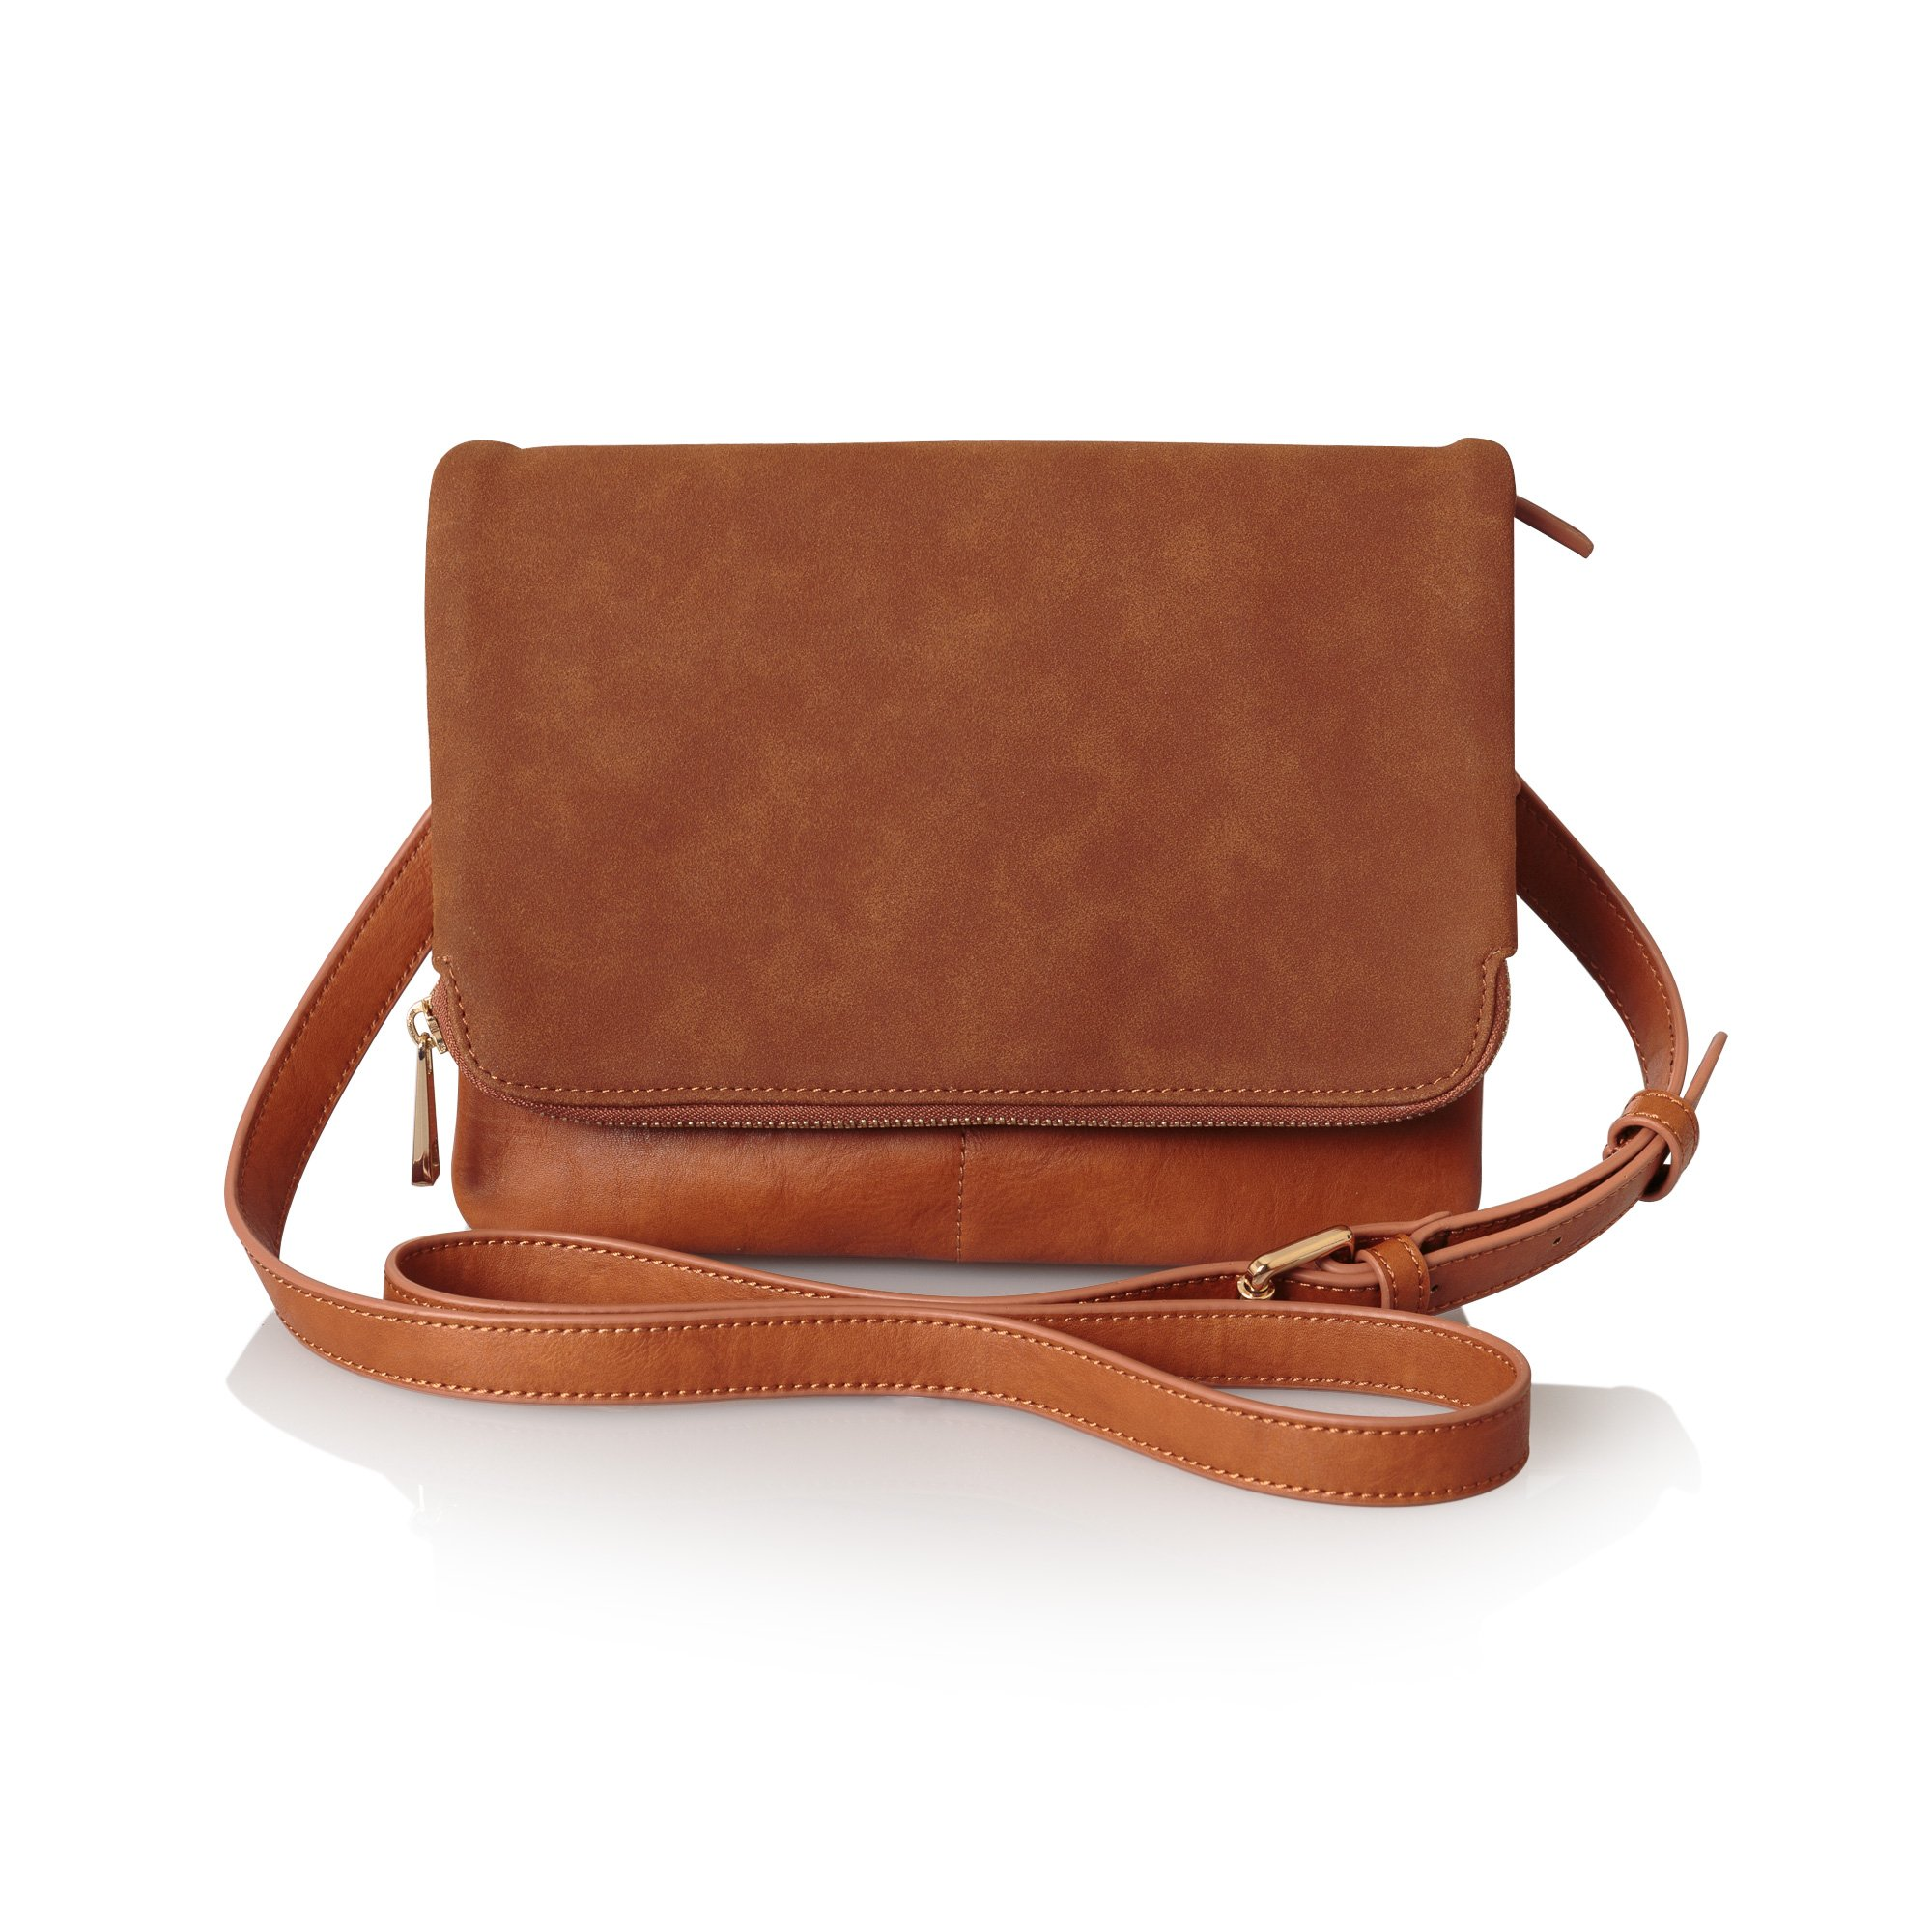 Tan Josie Cross Body Bag | Oliver Bonas